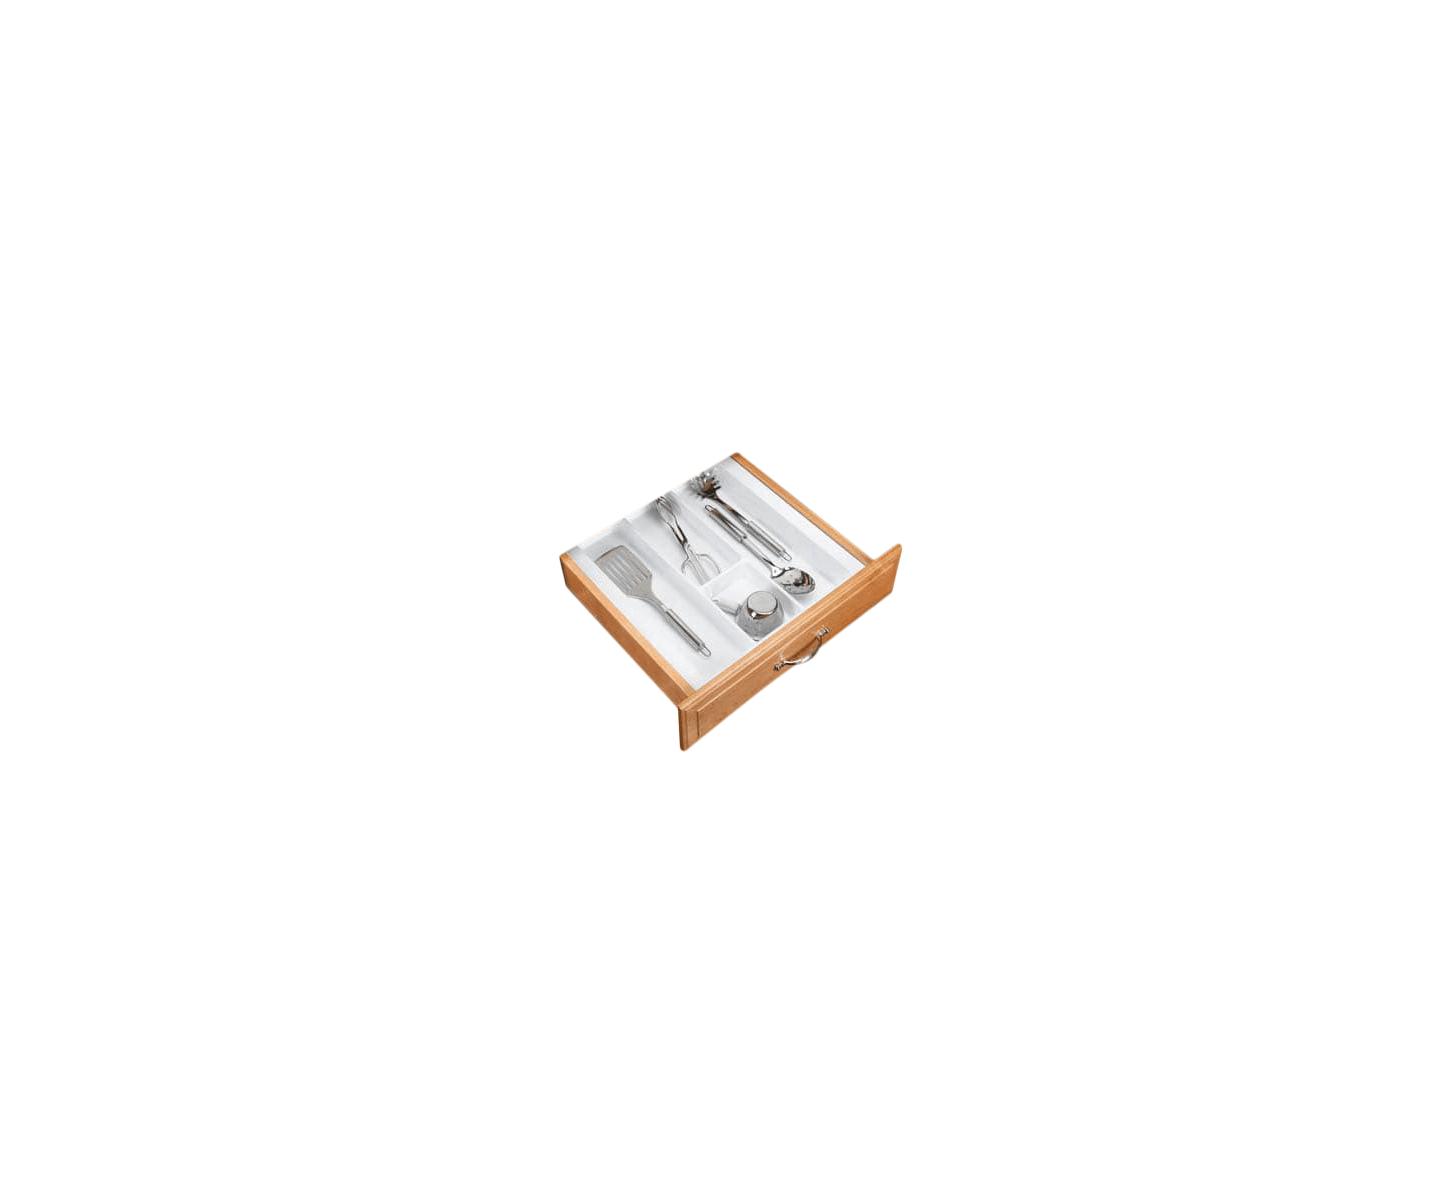 Rev-A-Shelf UT-15W-52 White UT Series 17-1/2 Inch Wide Trimmable